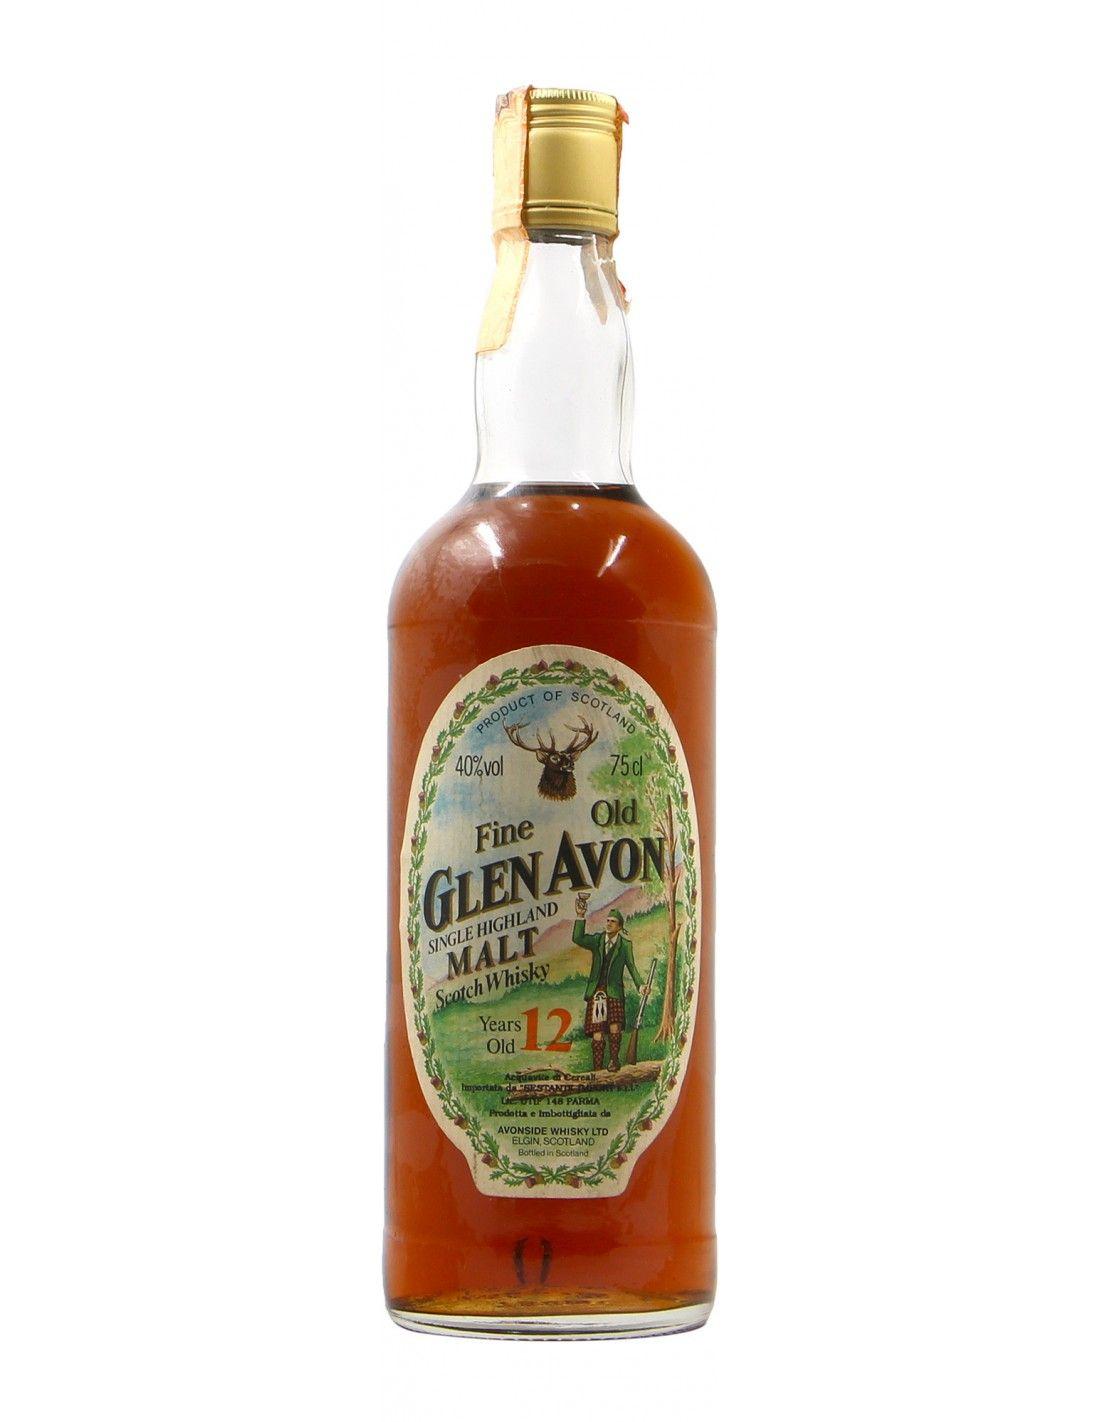 WHISKY FINE OLD GLEN AVON 12YO 75CL 40VOL BOTTLED 1990s NV GLEN AVON Grandi Bottiglie